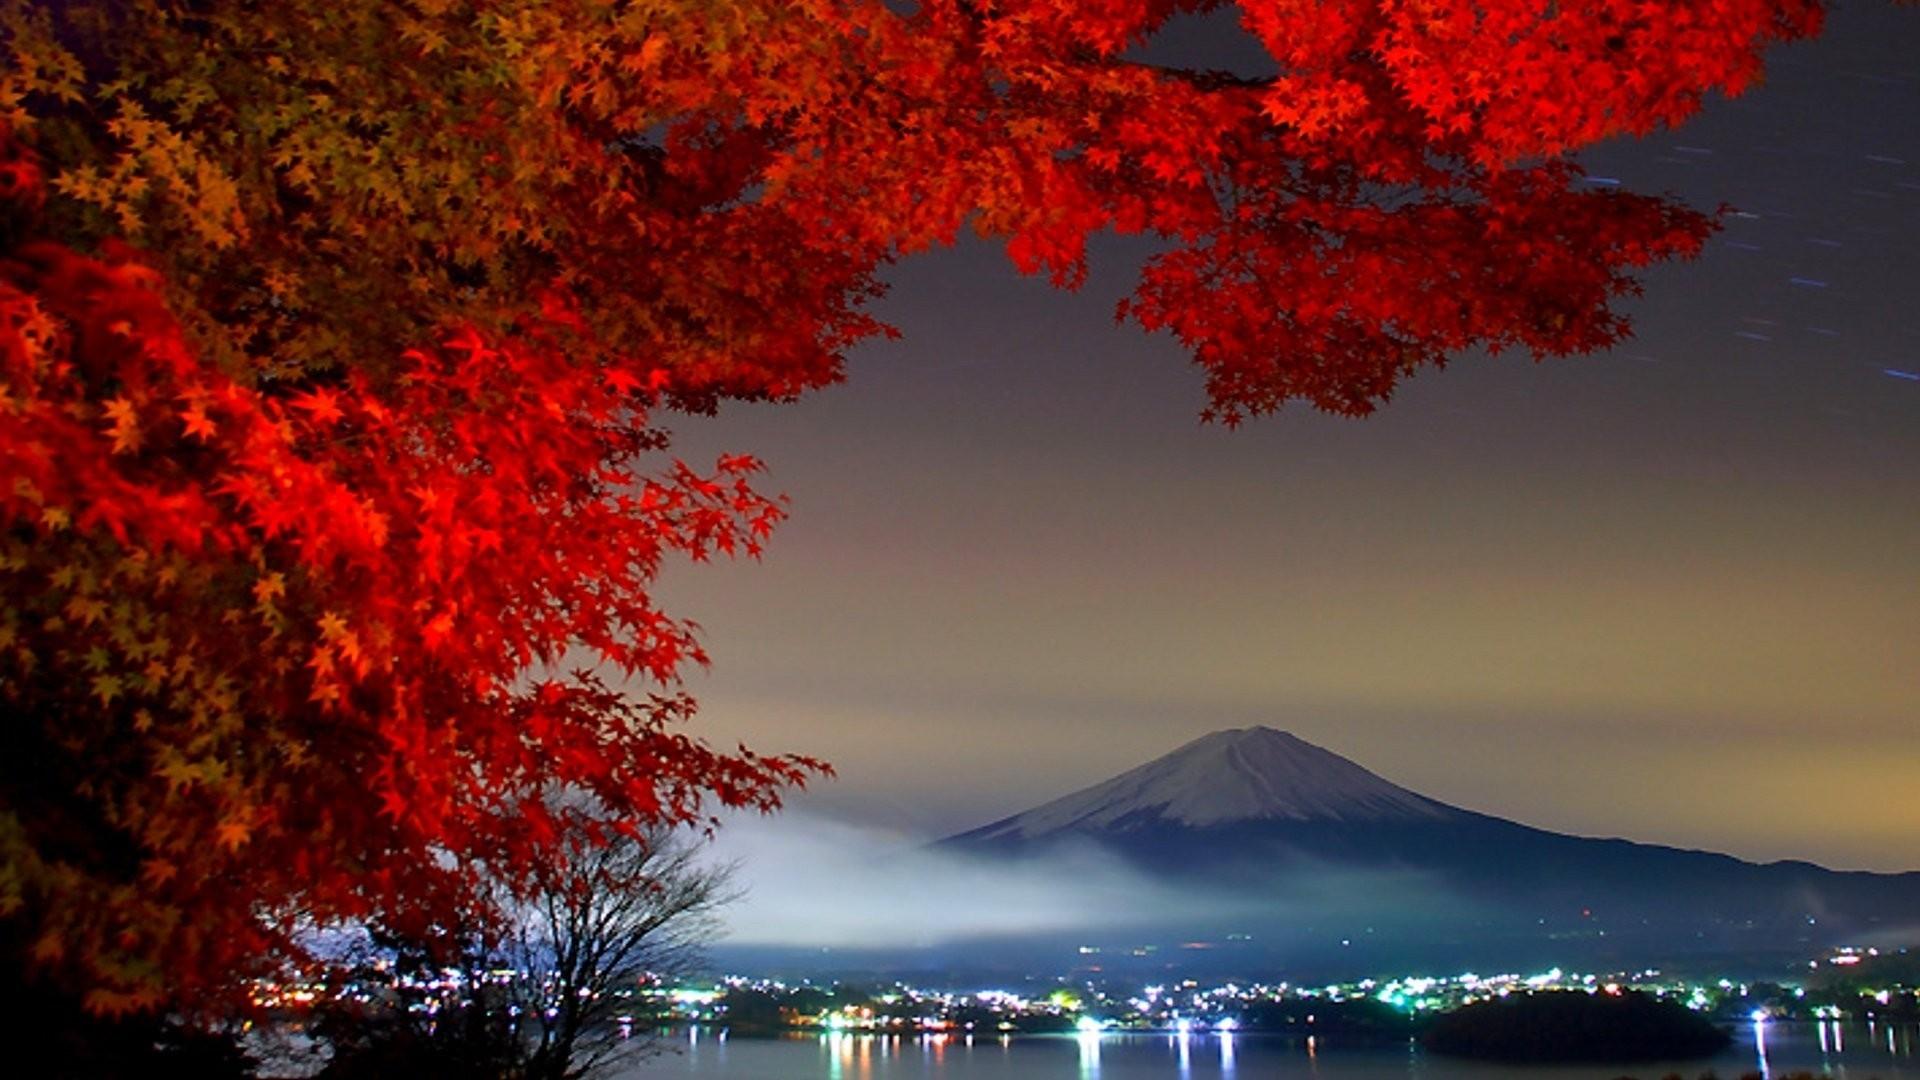 Autumn In City Nature Wallpaper